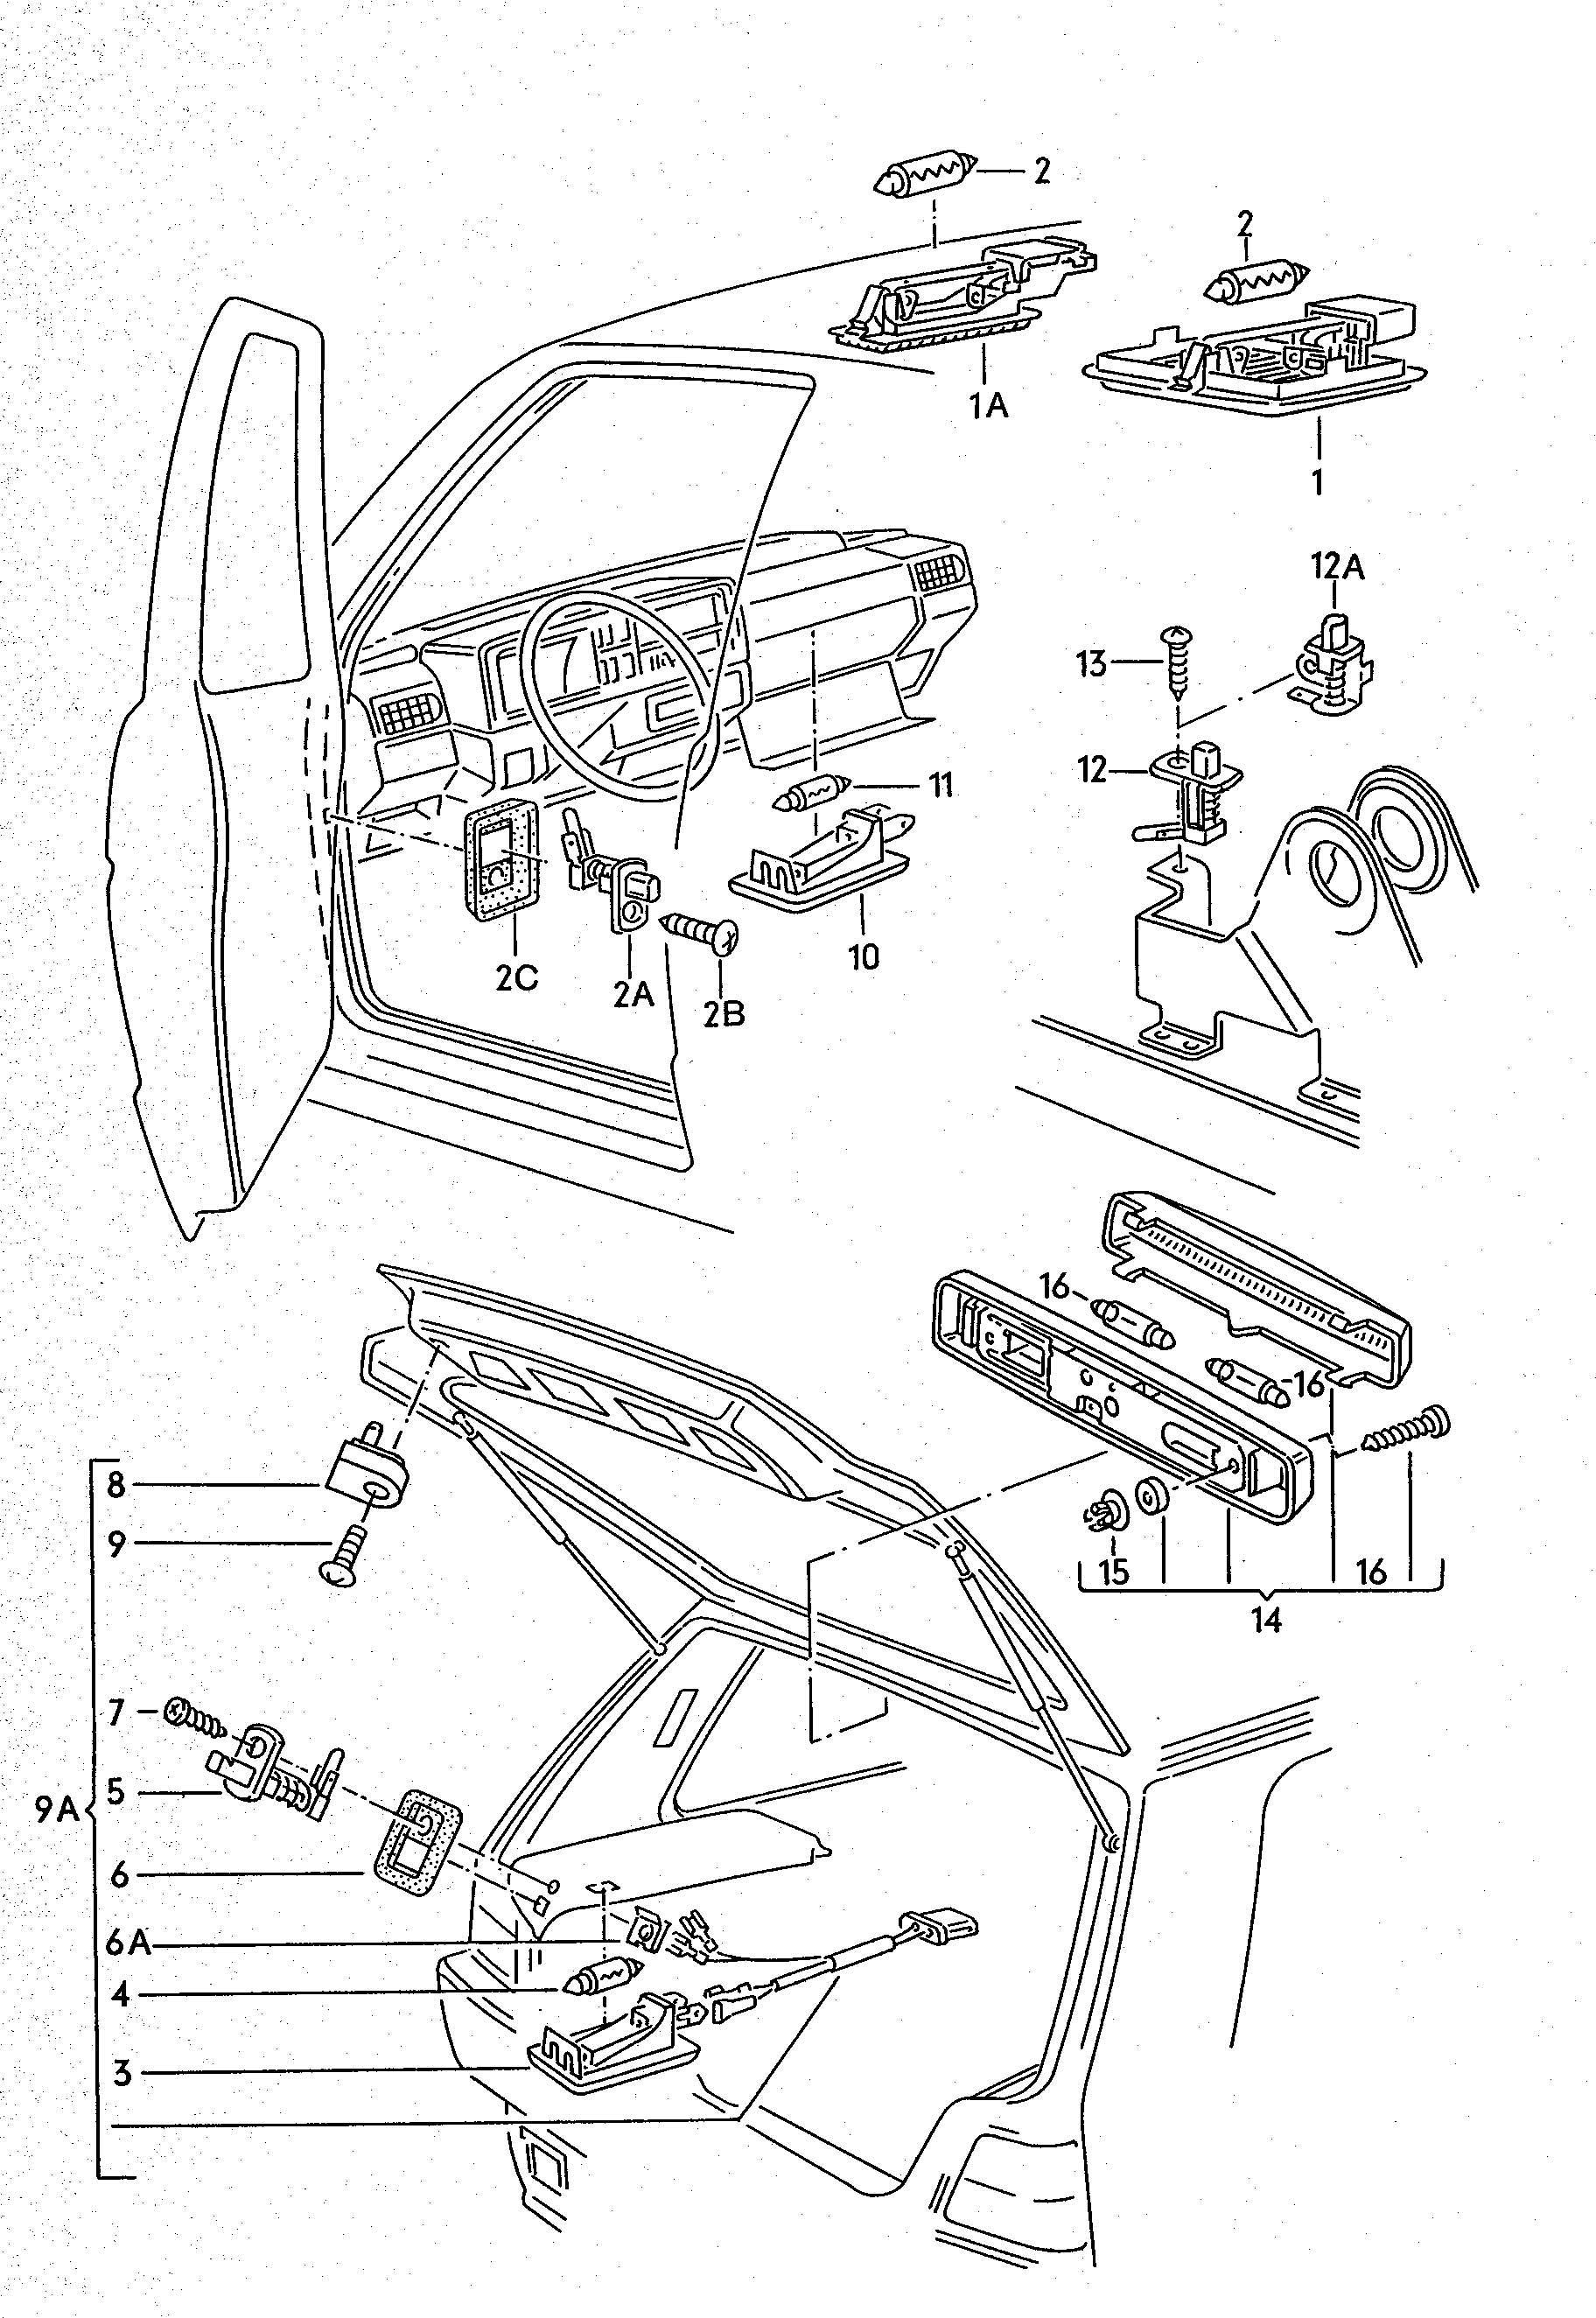 Volkswagen Jetta Step Light Interior Light Glove Box